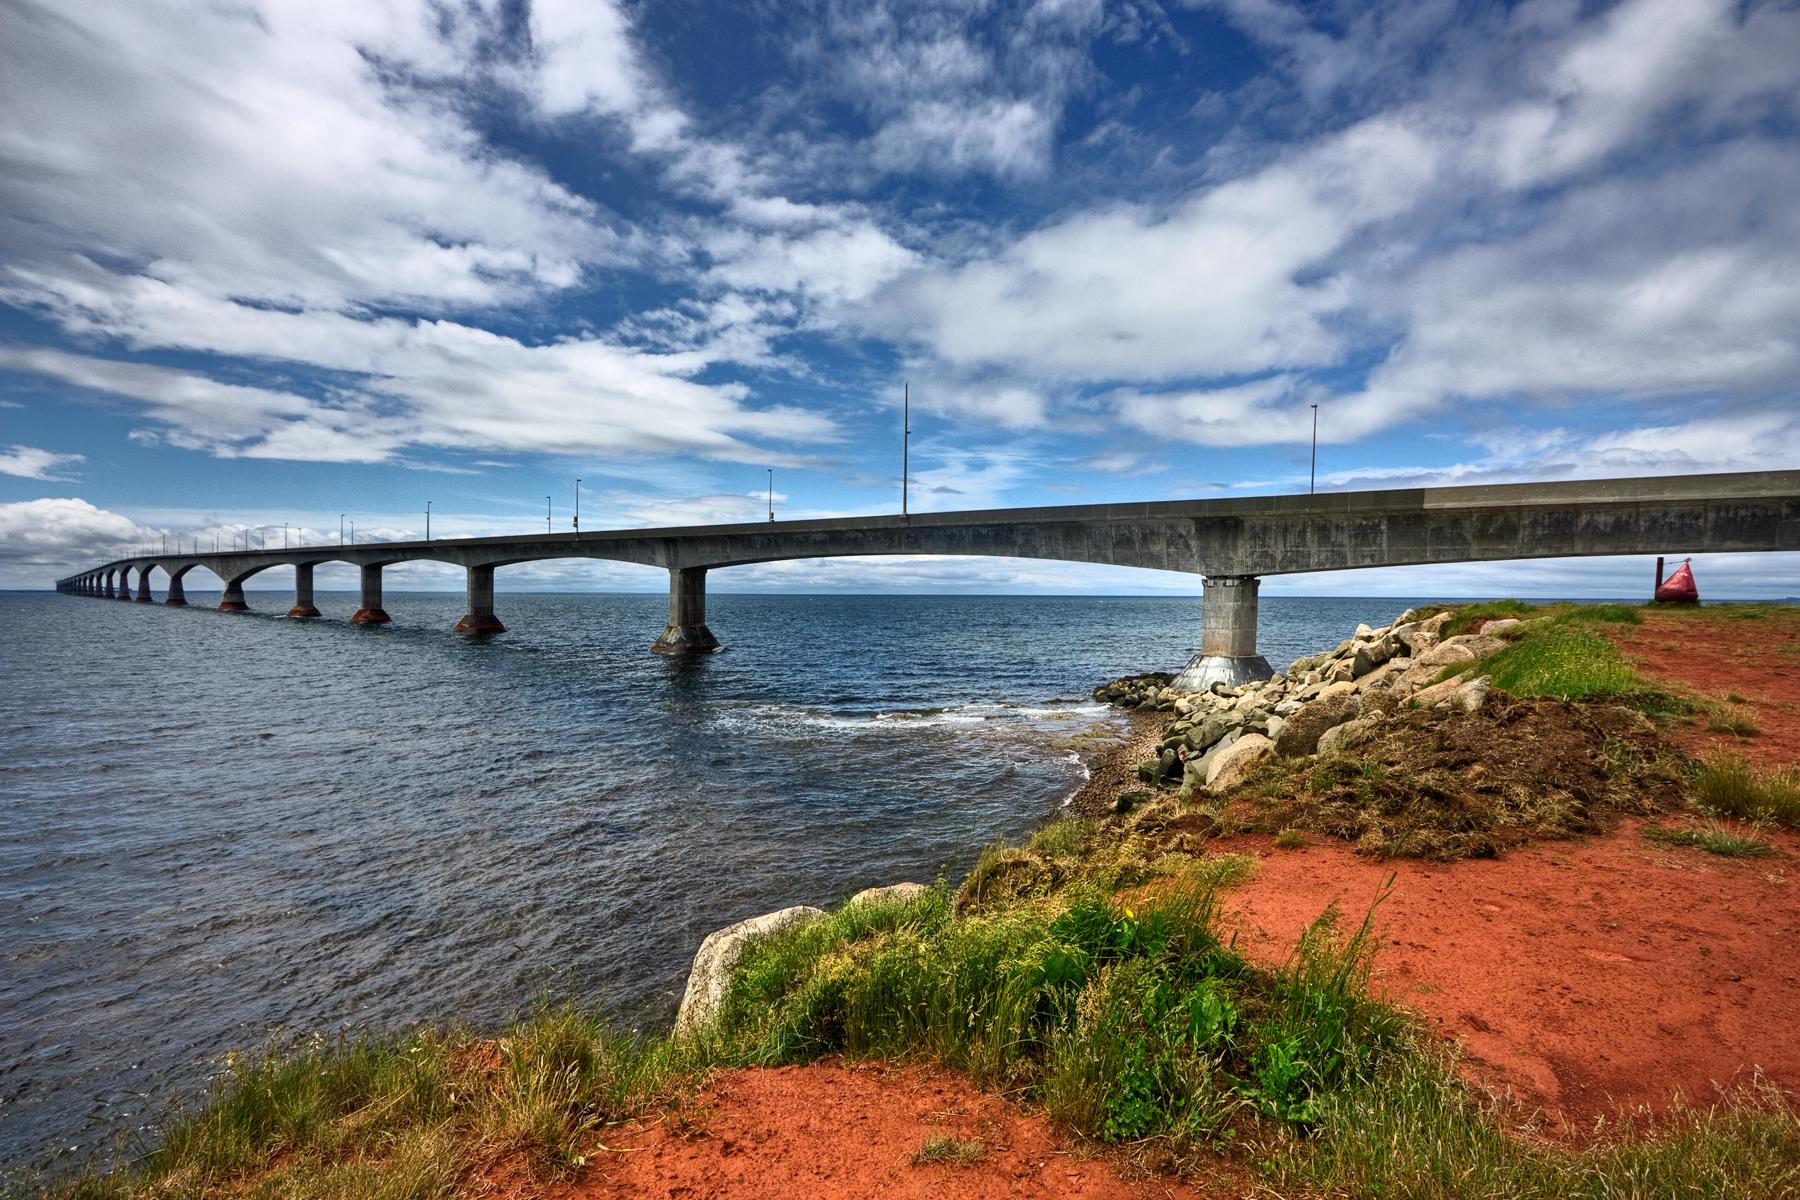 Confederation bridge - hdr photo